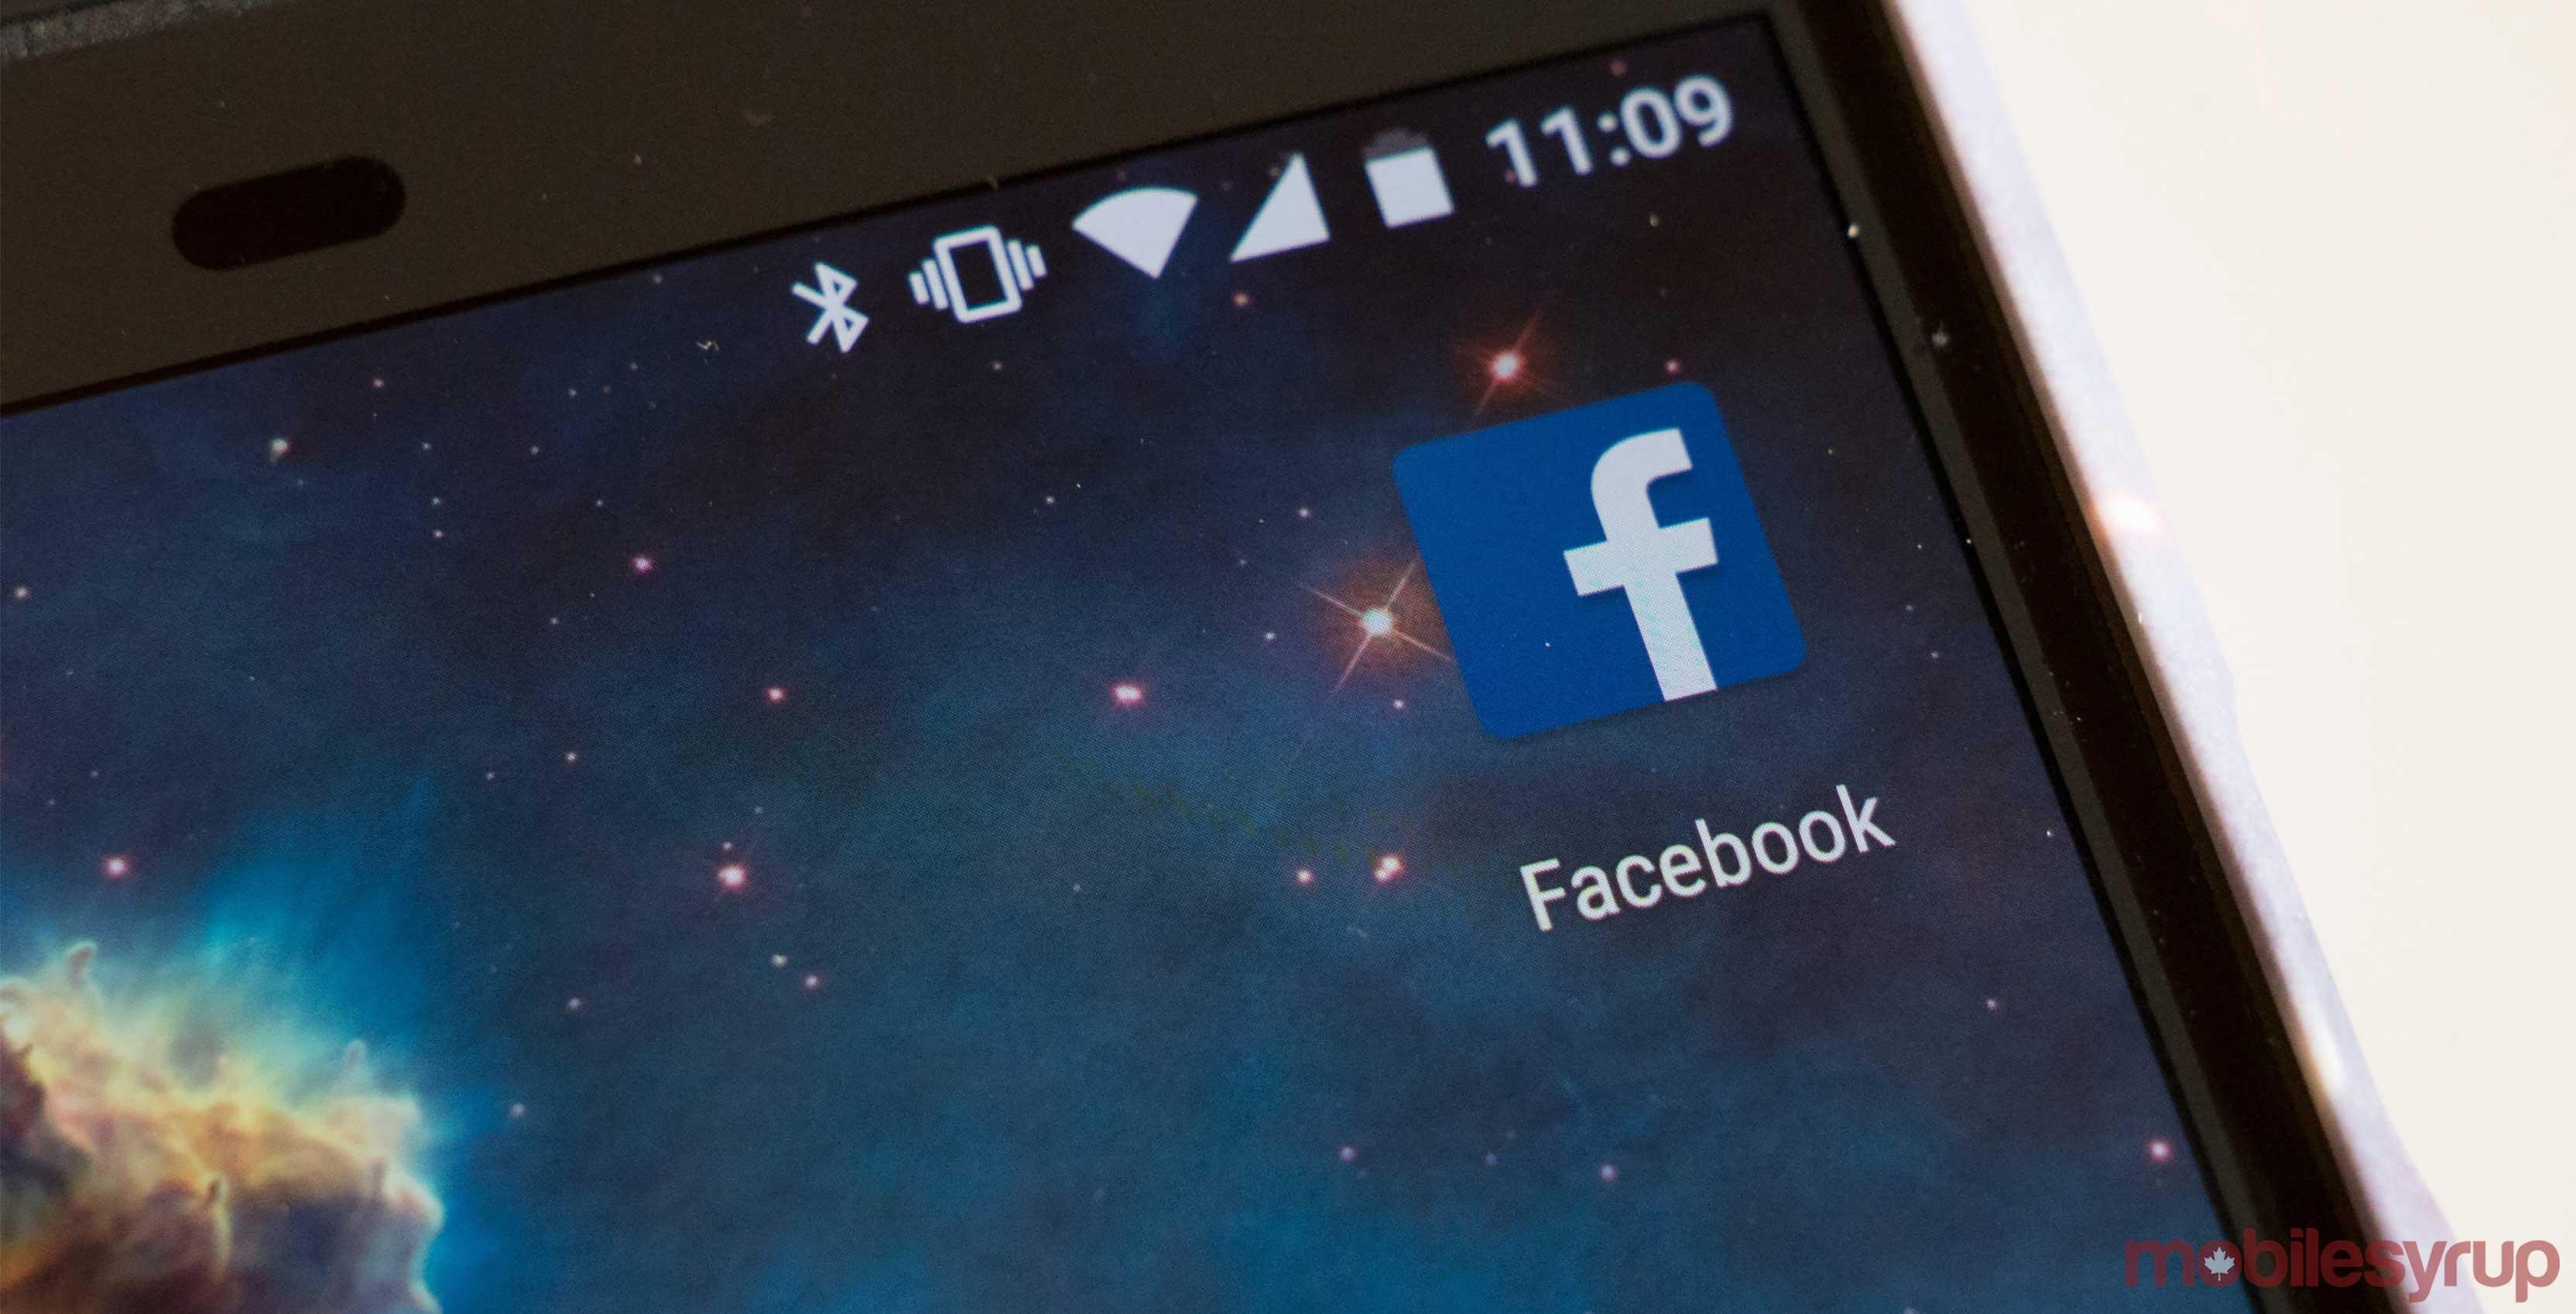 Facebook app on phone